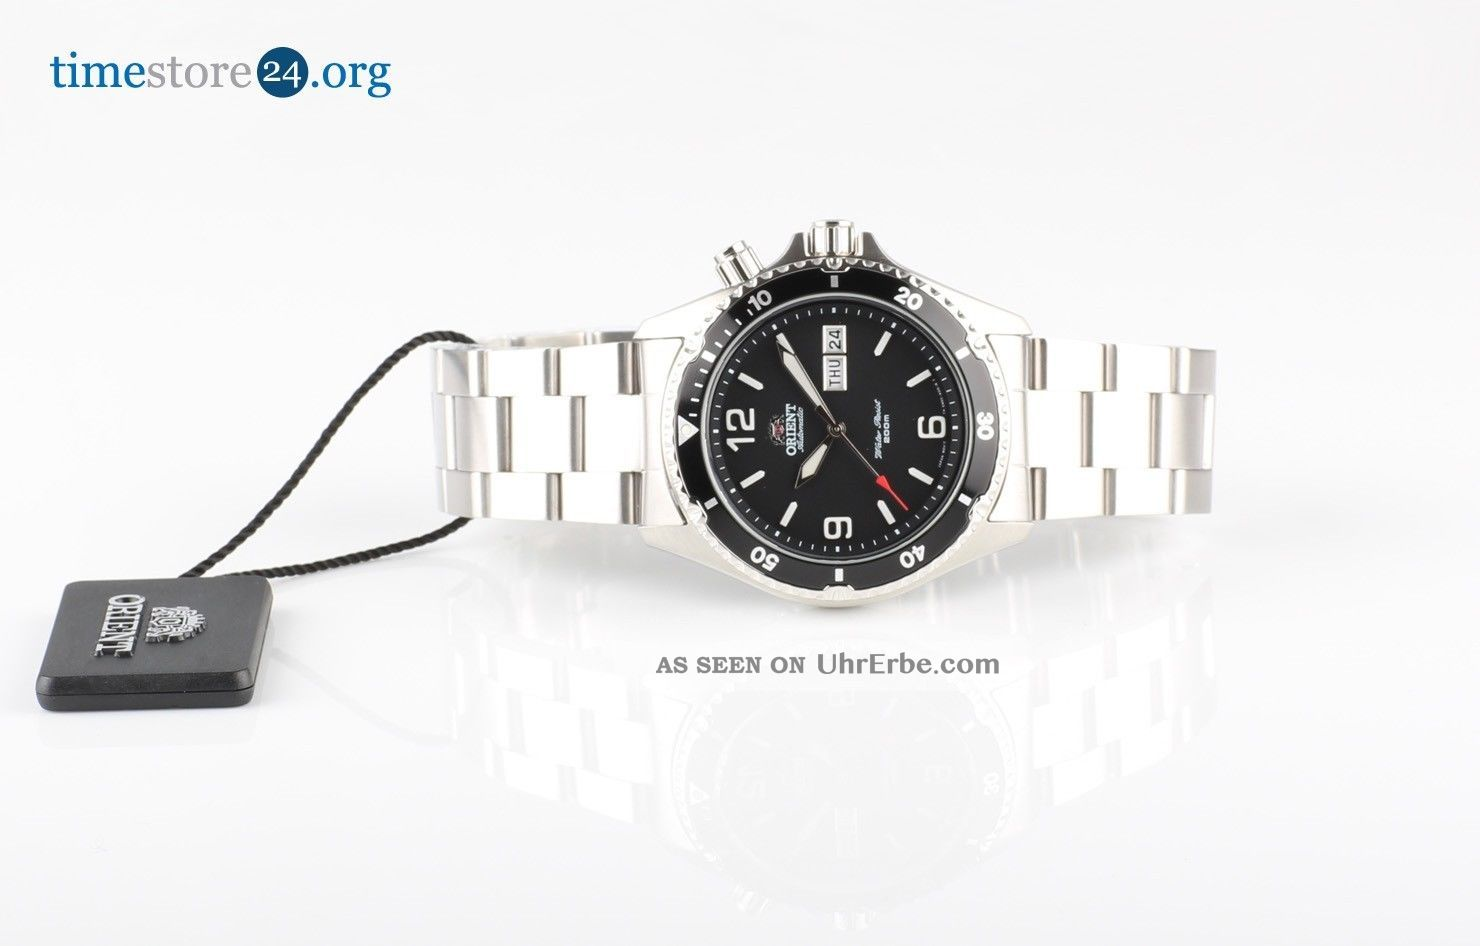 Herrenuhr Automatikuhr Orient Cem65001b Herrenuhr Automatik Edelstahl Uhr Armbanduhren Bild